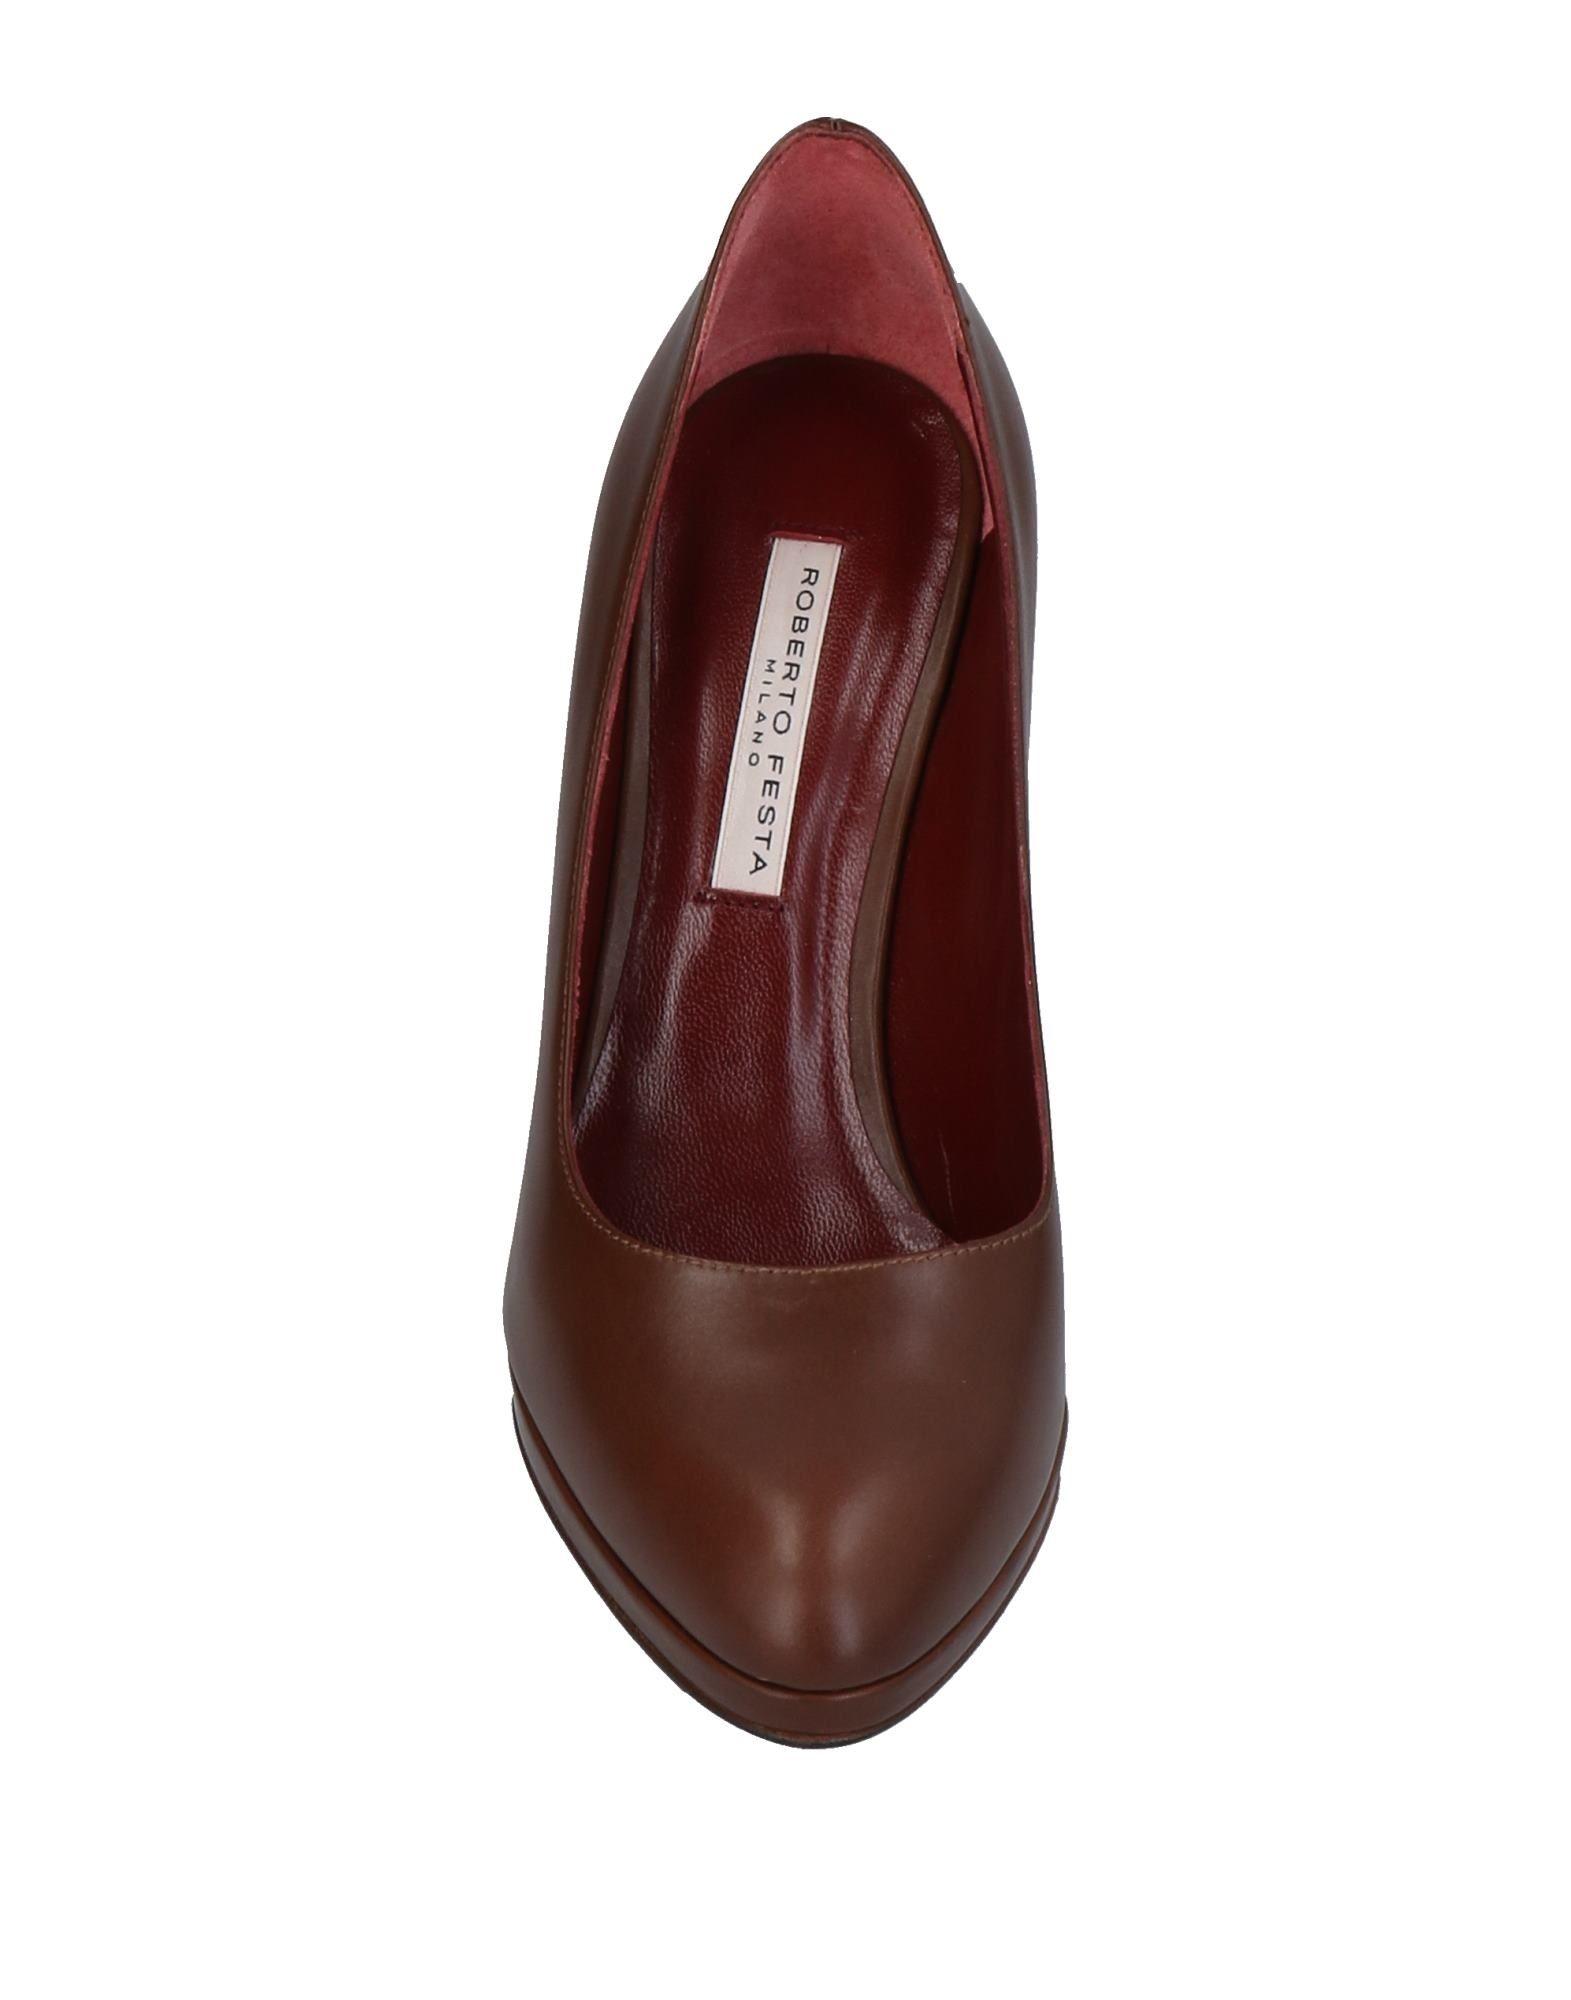 Stilvolle billige Schuhe Roberto Festa 11455088XP Pumps Damen  11455088XP Festa bf4bc7